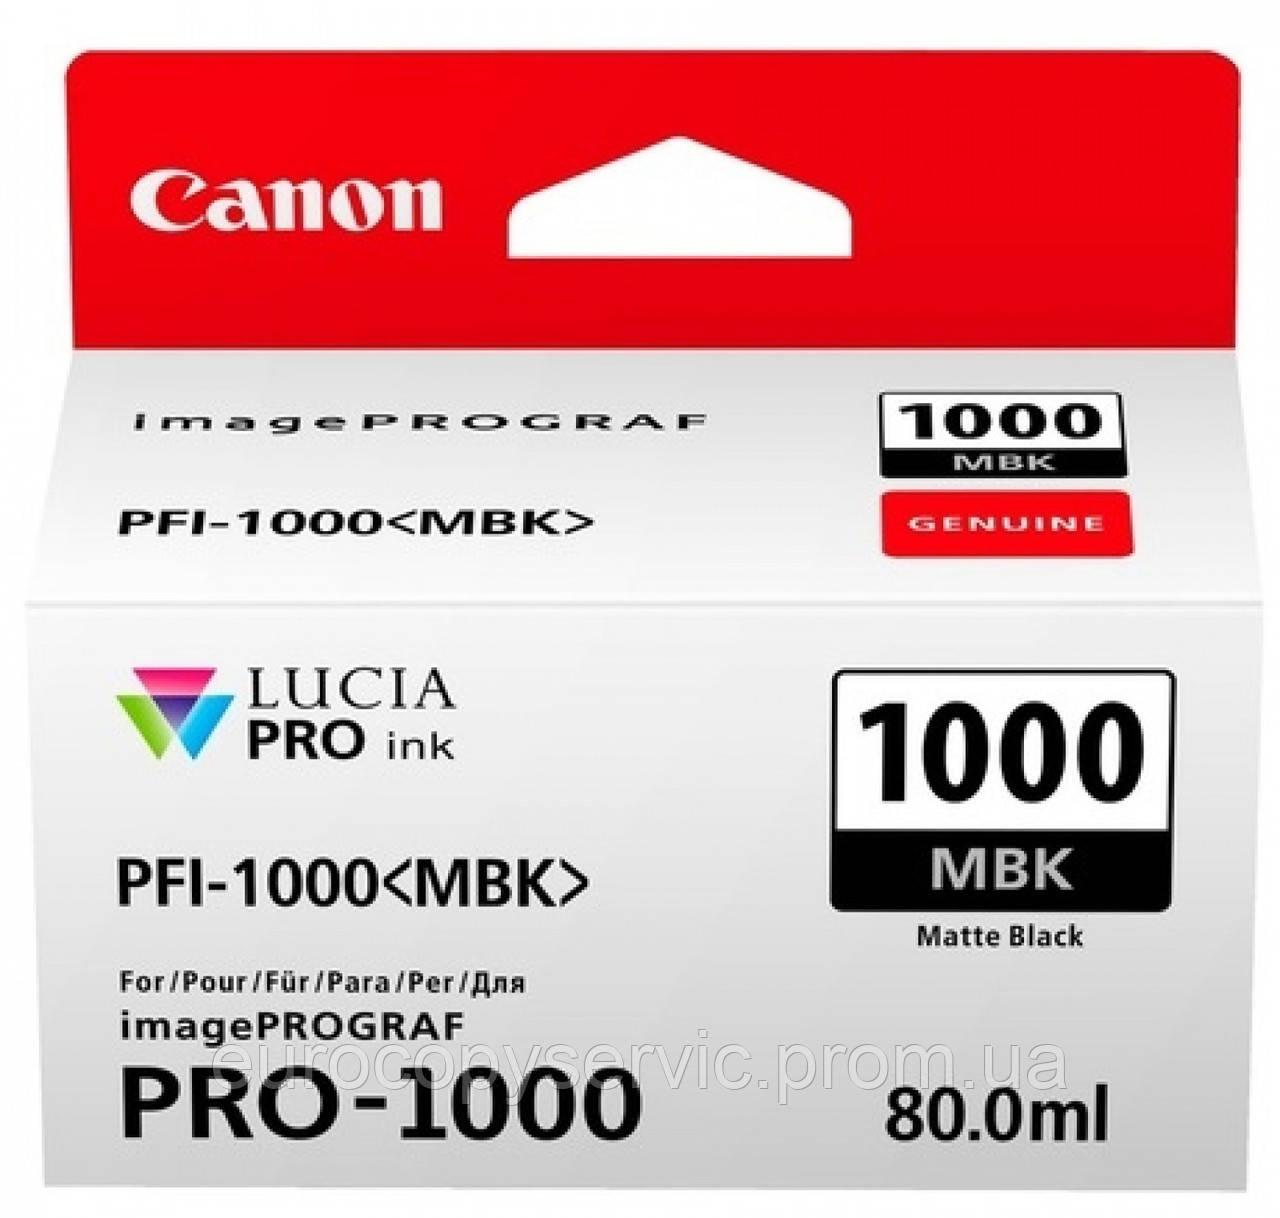 Картридж Canon PFI-1000MBk Matte black (0545C001) Original